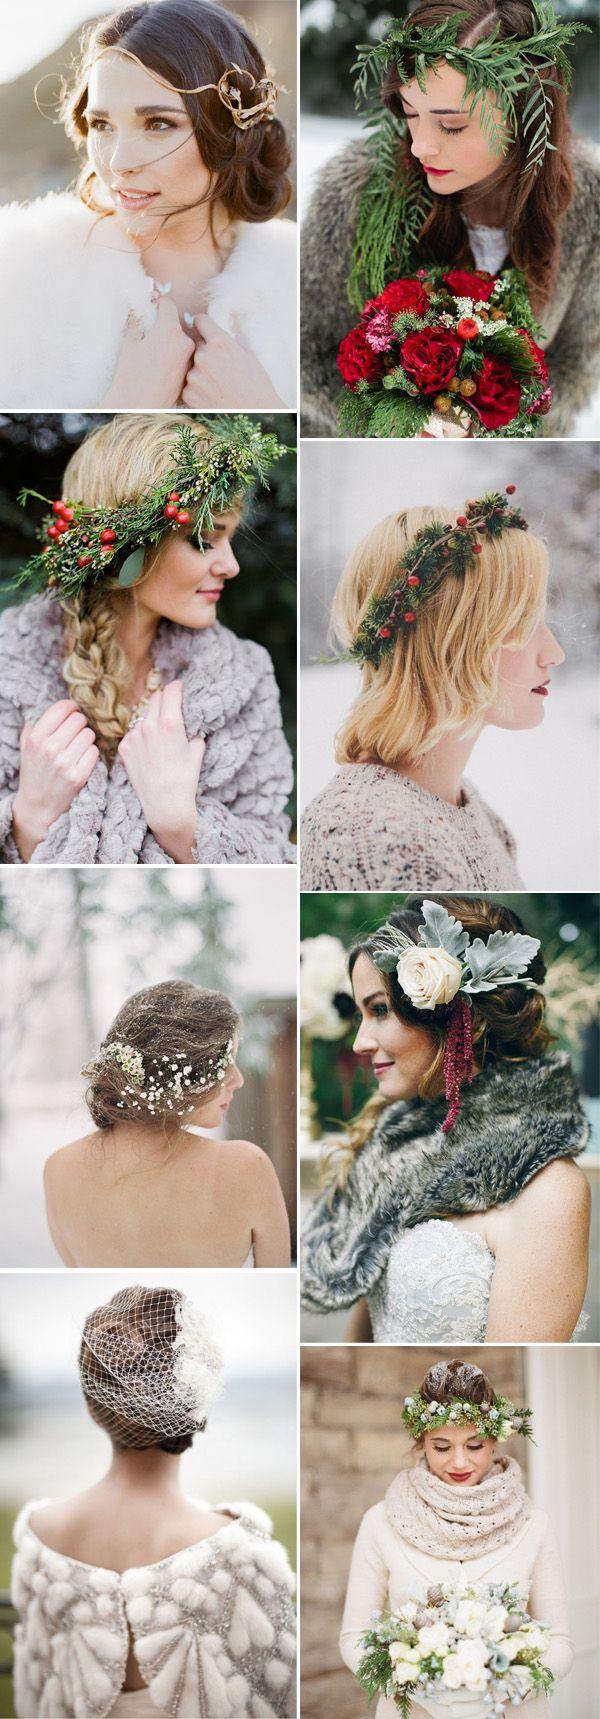 5 year wedding anniversary decorations november 2018  best Future wedding images on Pinterest  Beautiful wedding